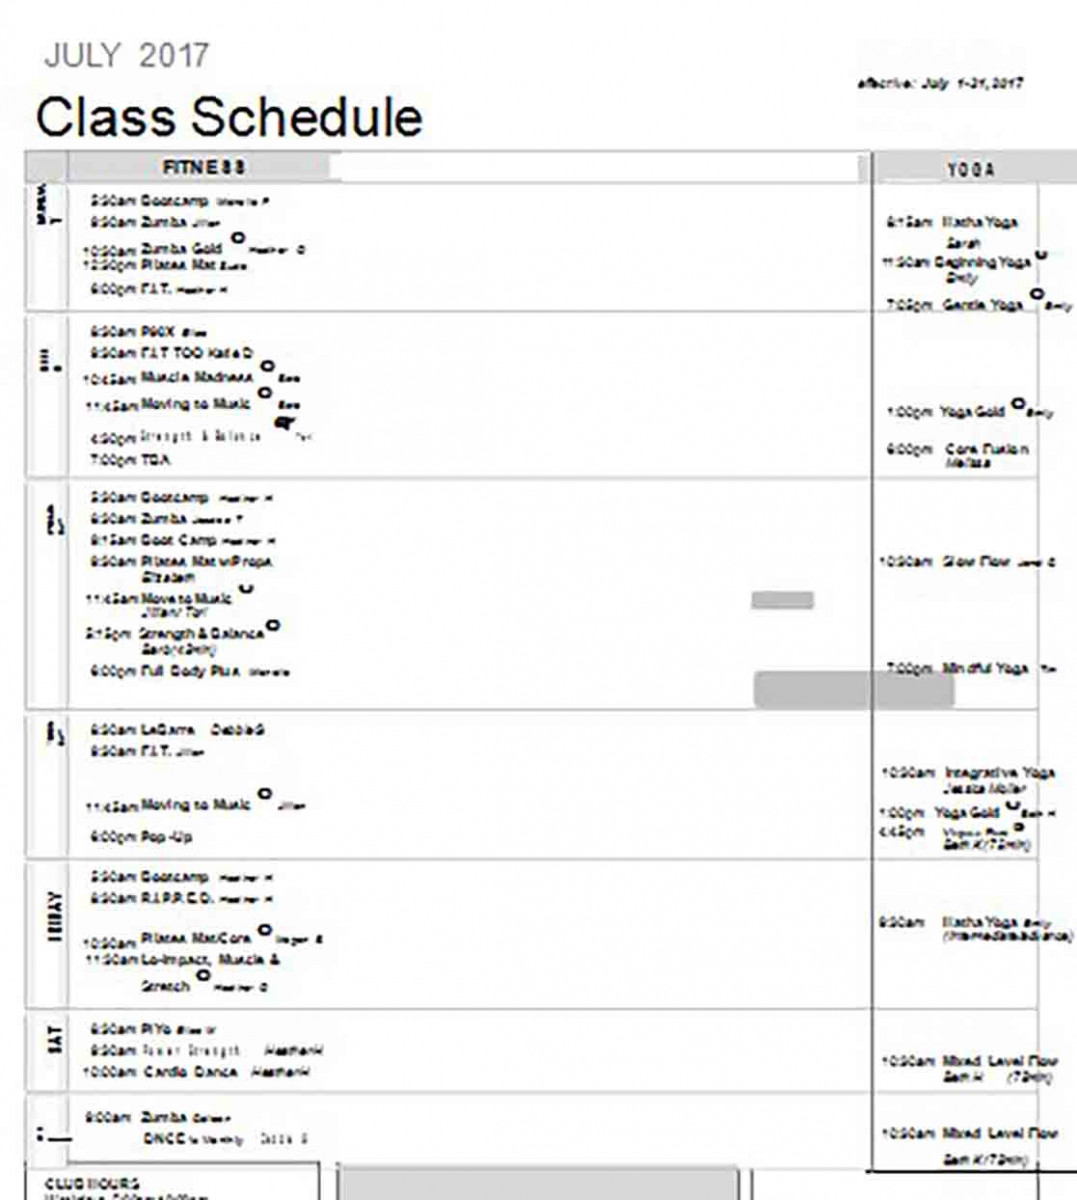 Class Schedule templates